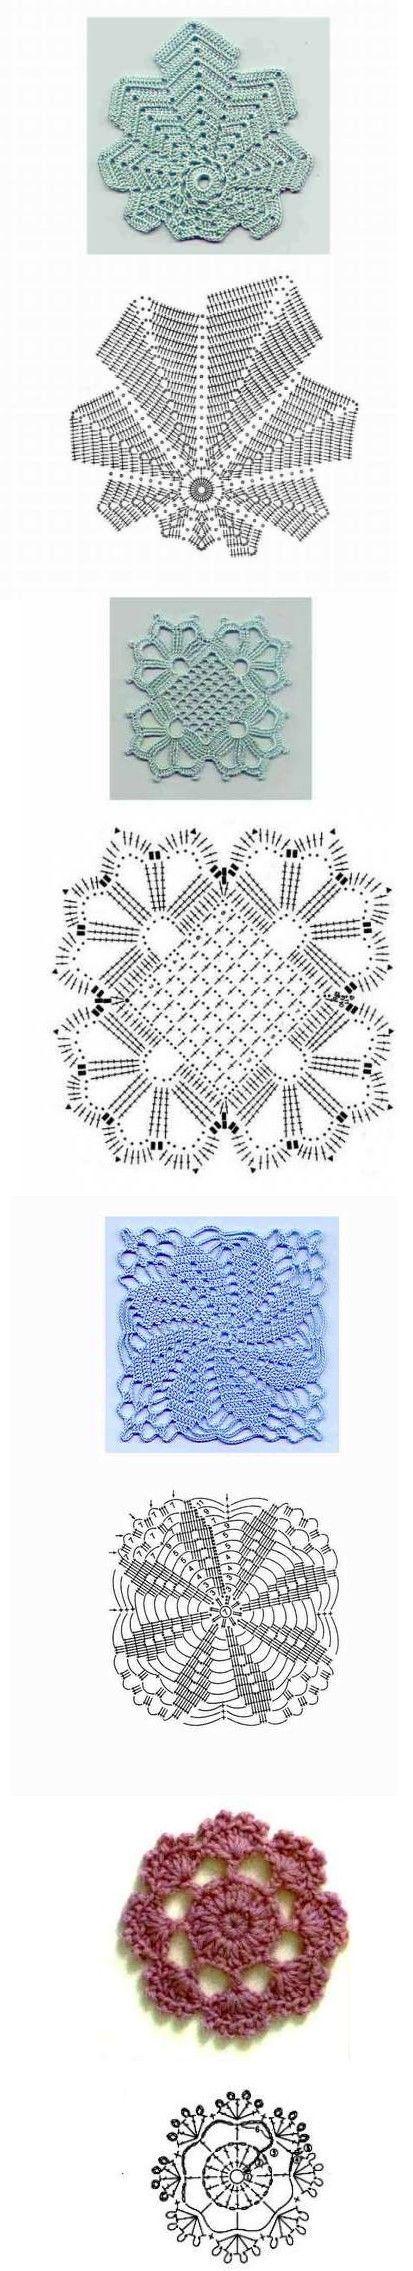 10 Crochet Motif Pins you might like